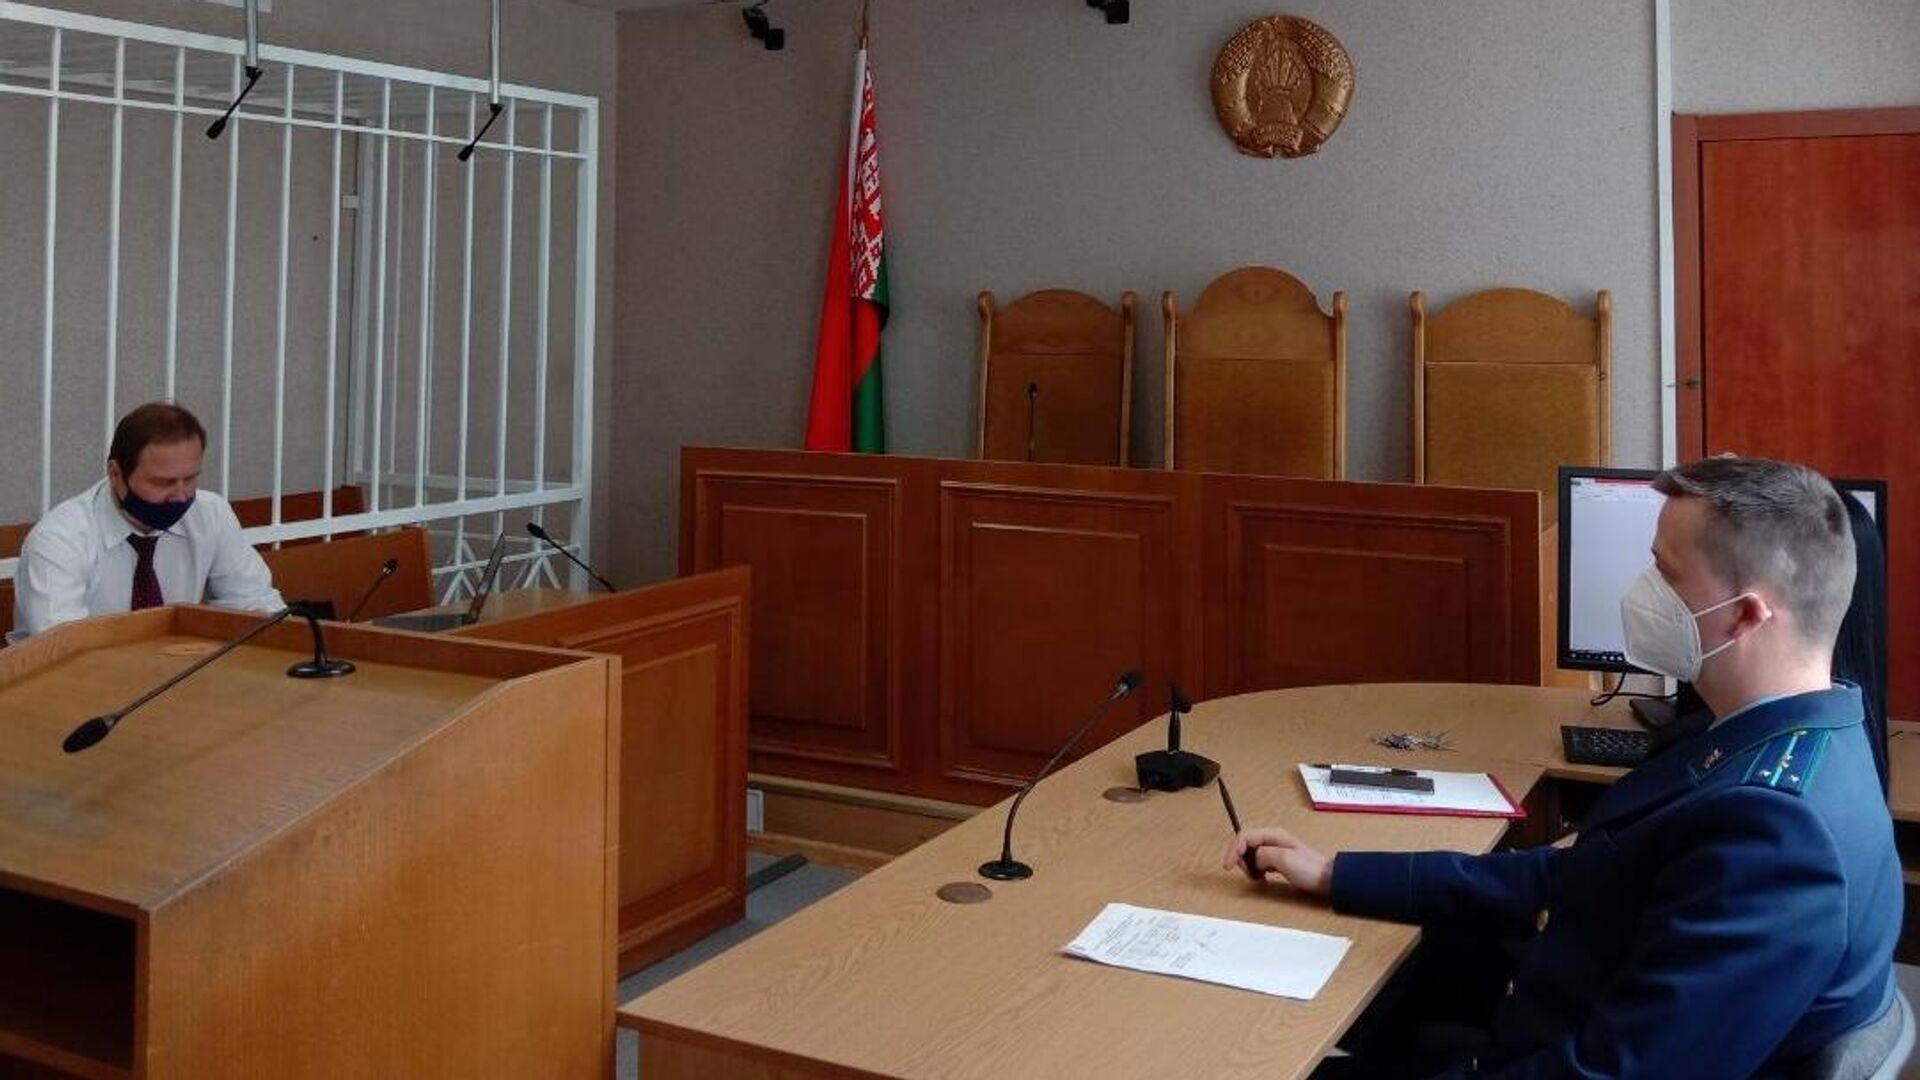 Адвокат Александр Филанович во время заседания суда по делу россиянки Софии Сапеги в Минске - РИА Новости, 1920, 13.06.2021